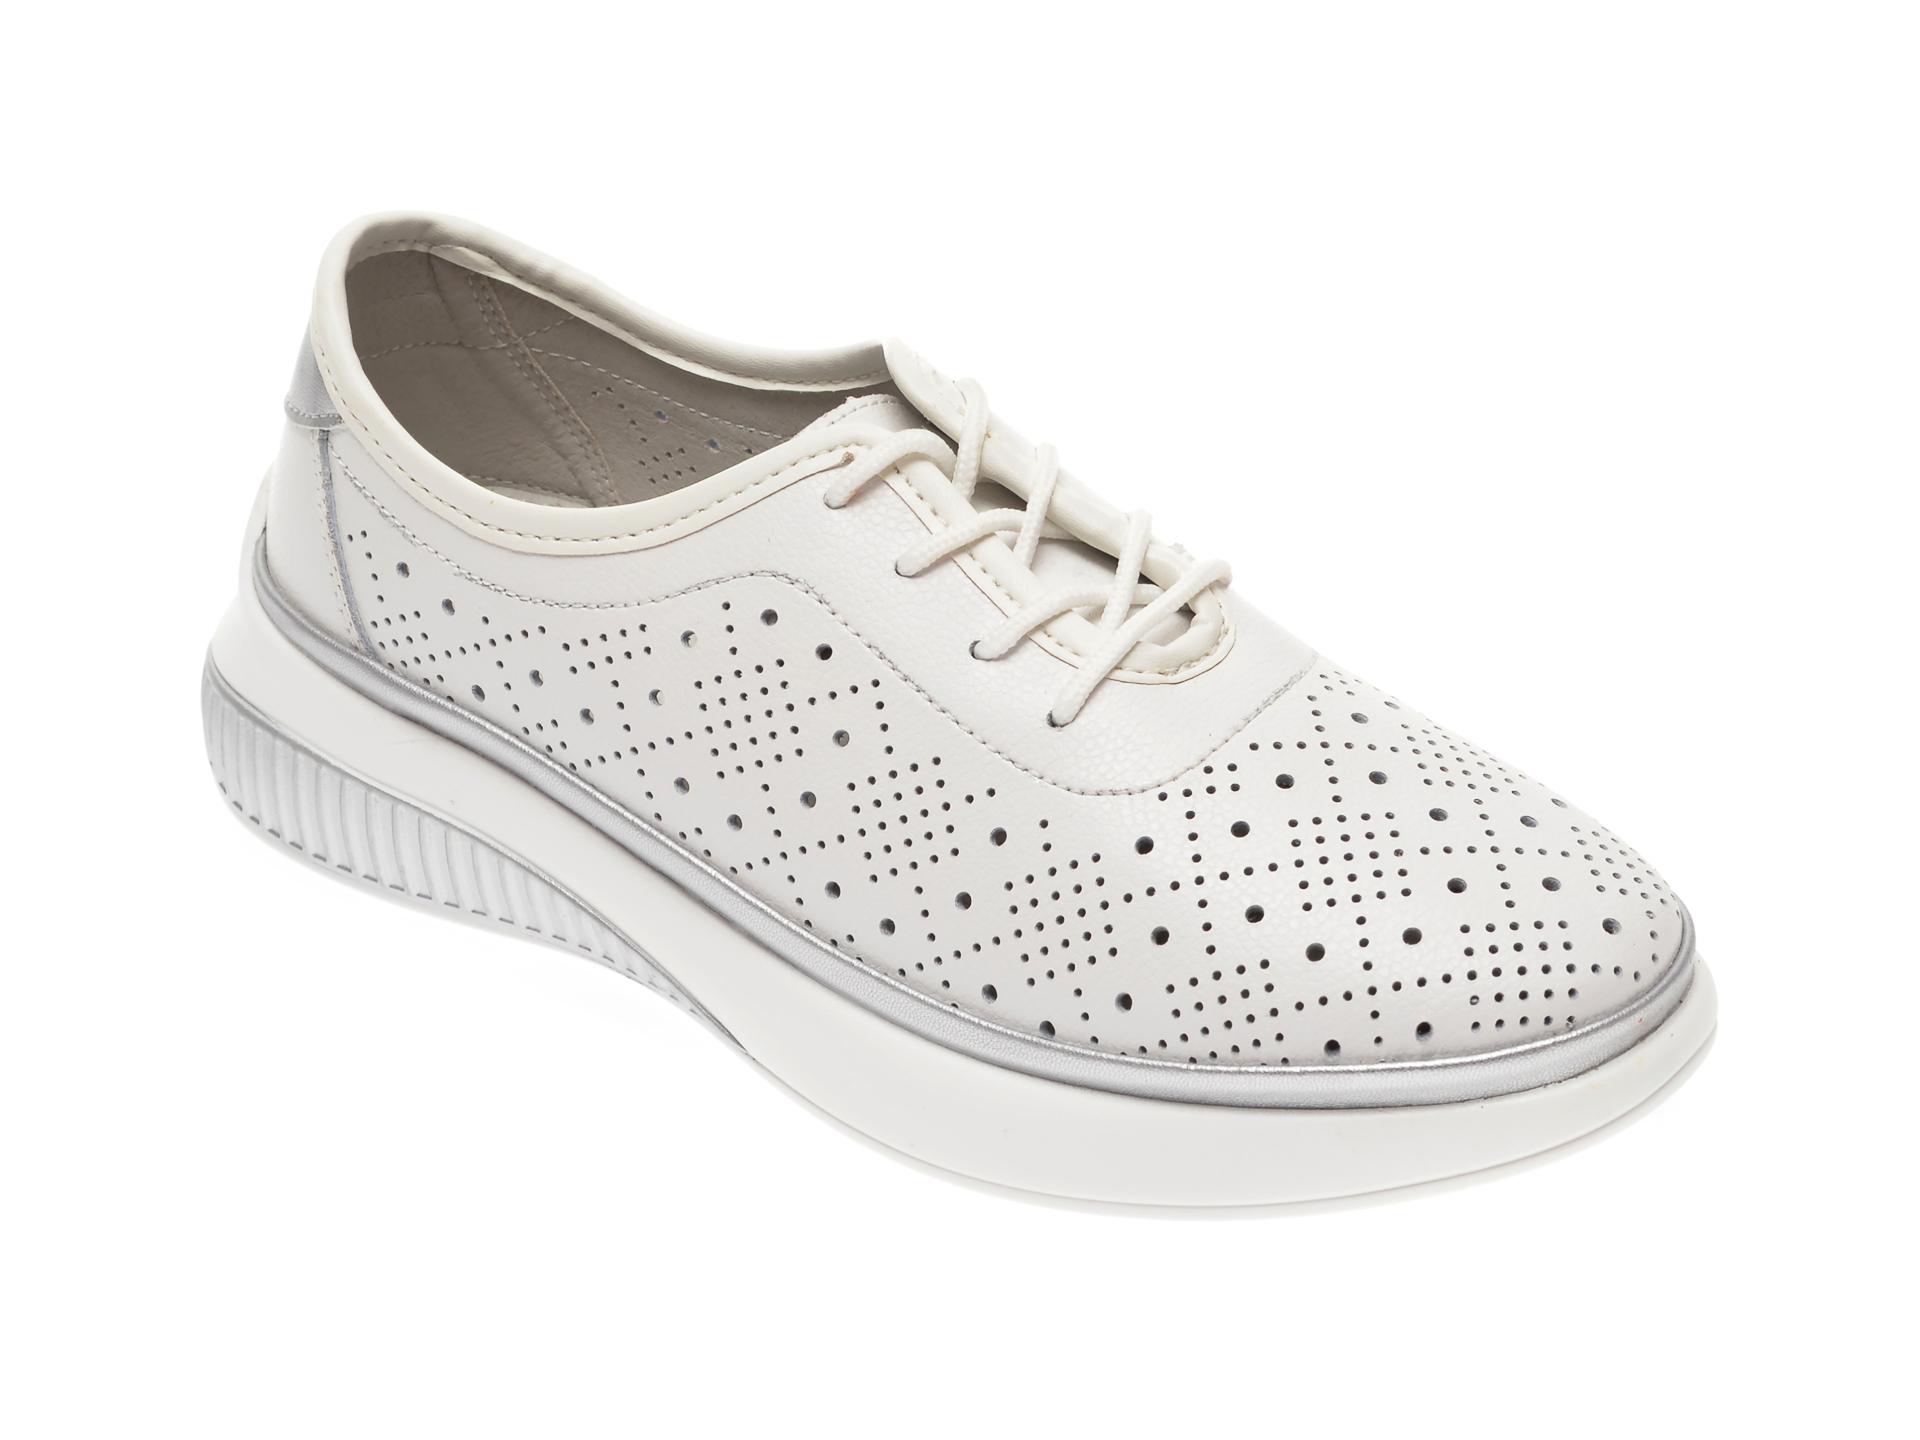 Pantofi IMAGE albi, 807, din piele naturala